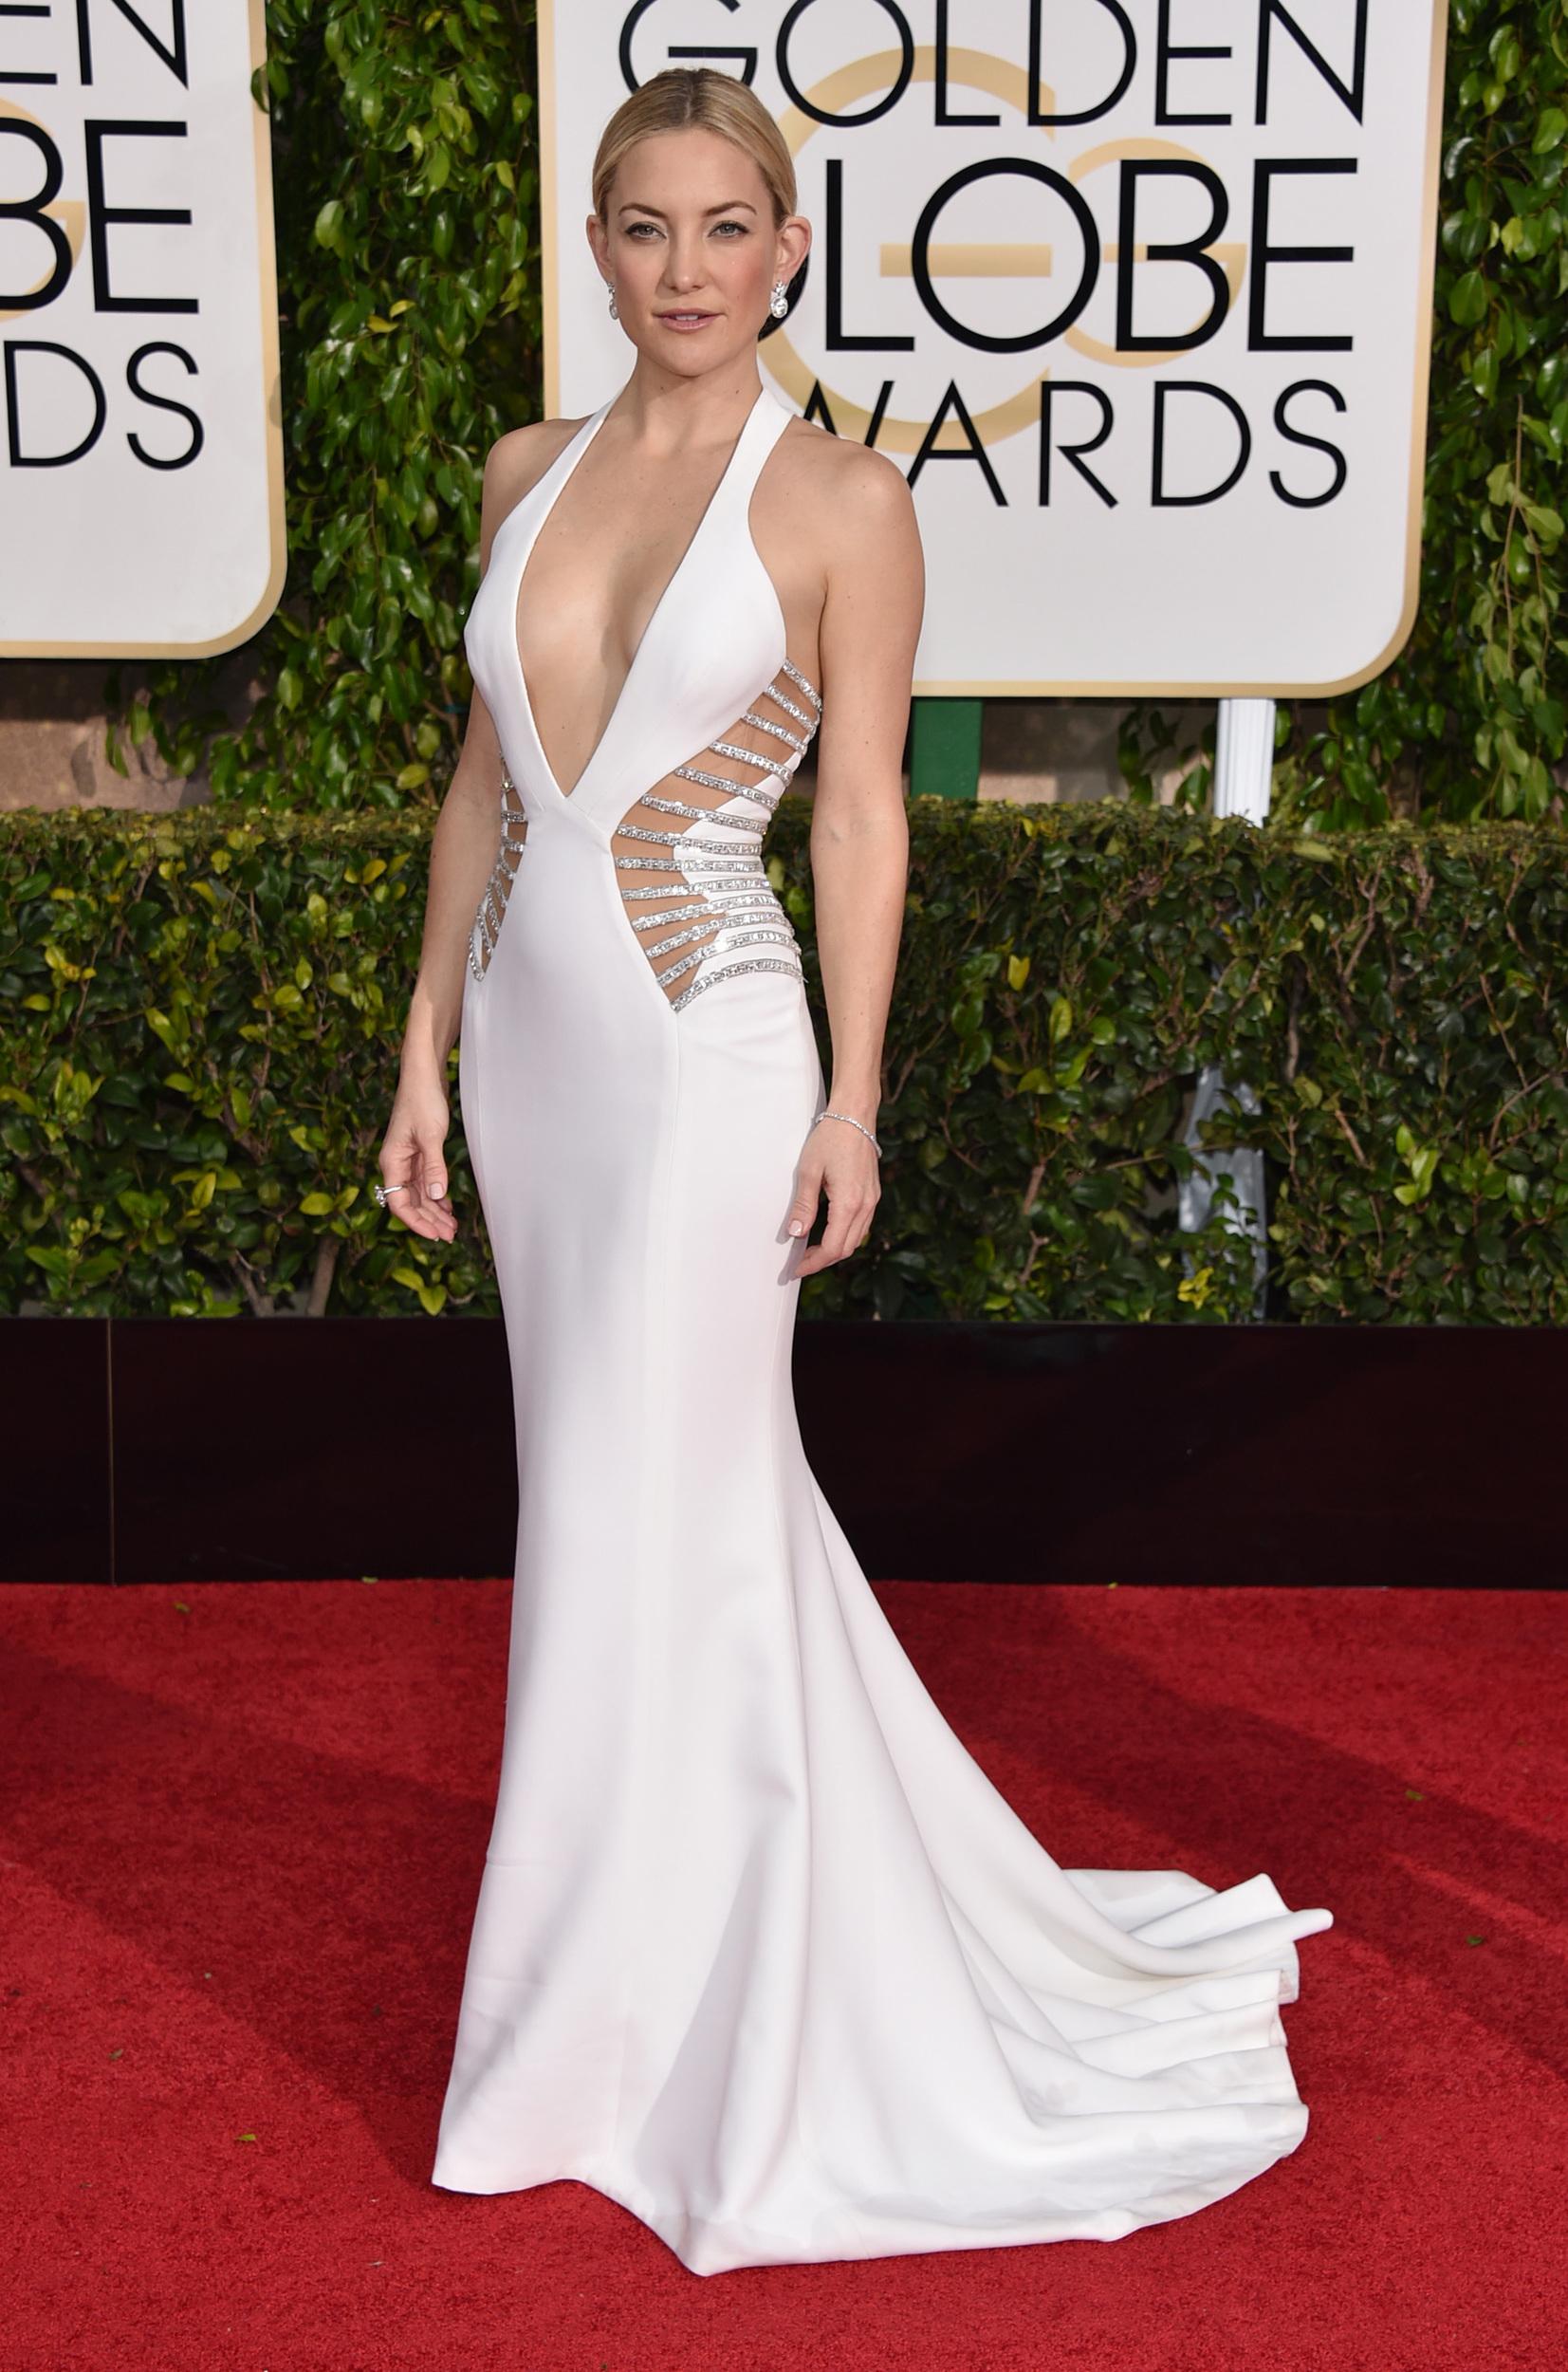 Kate Hudson wearing White Cutout Evening Dress, Silver Earrings ...